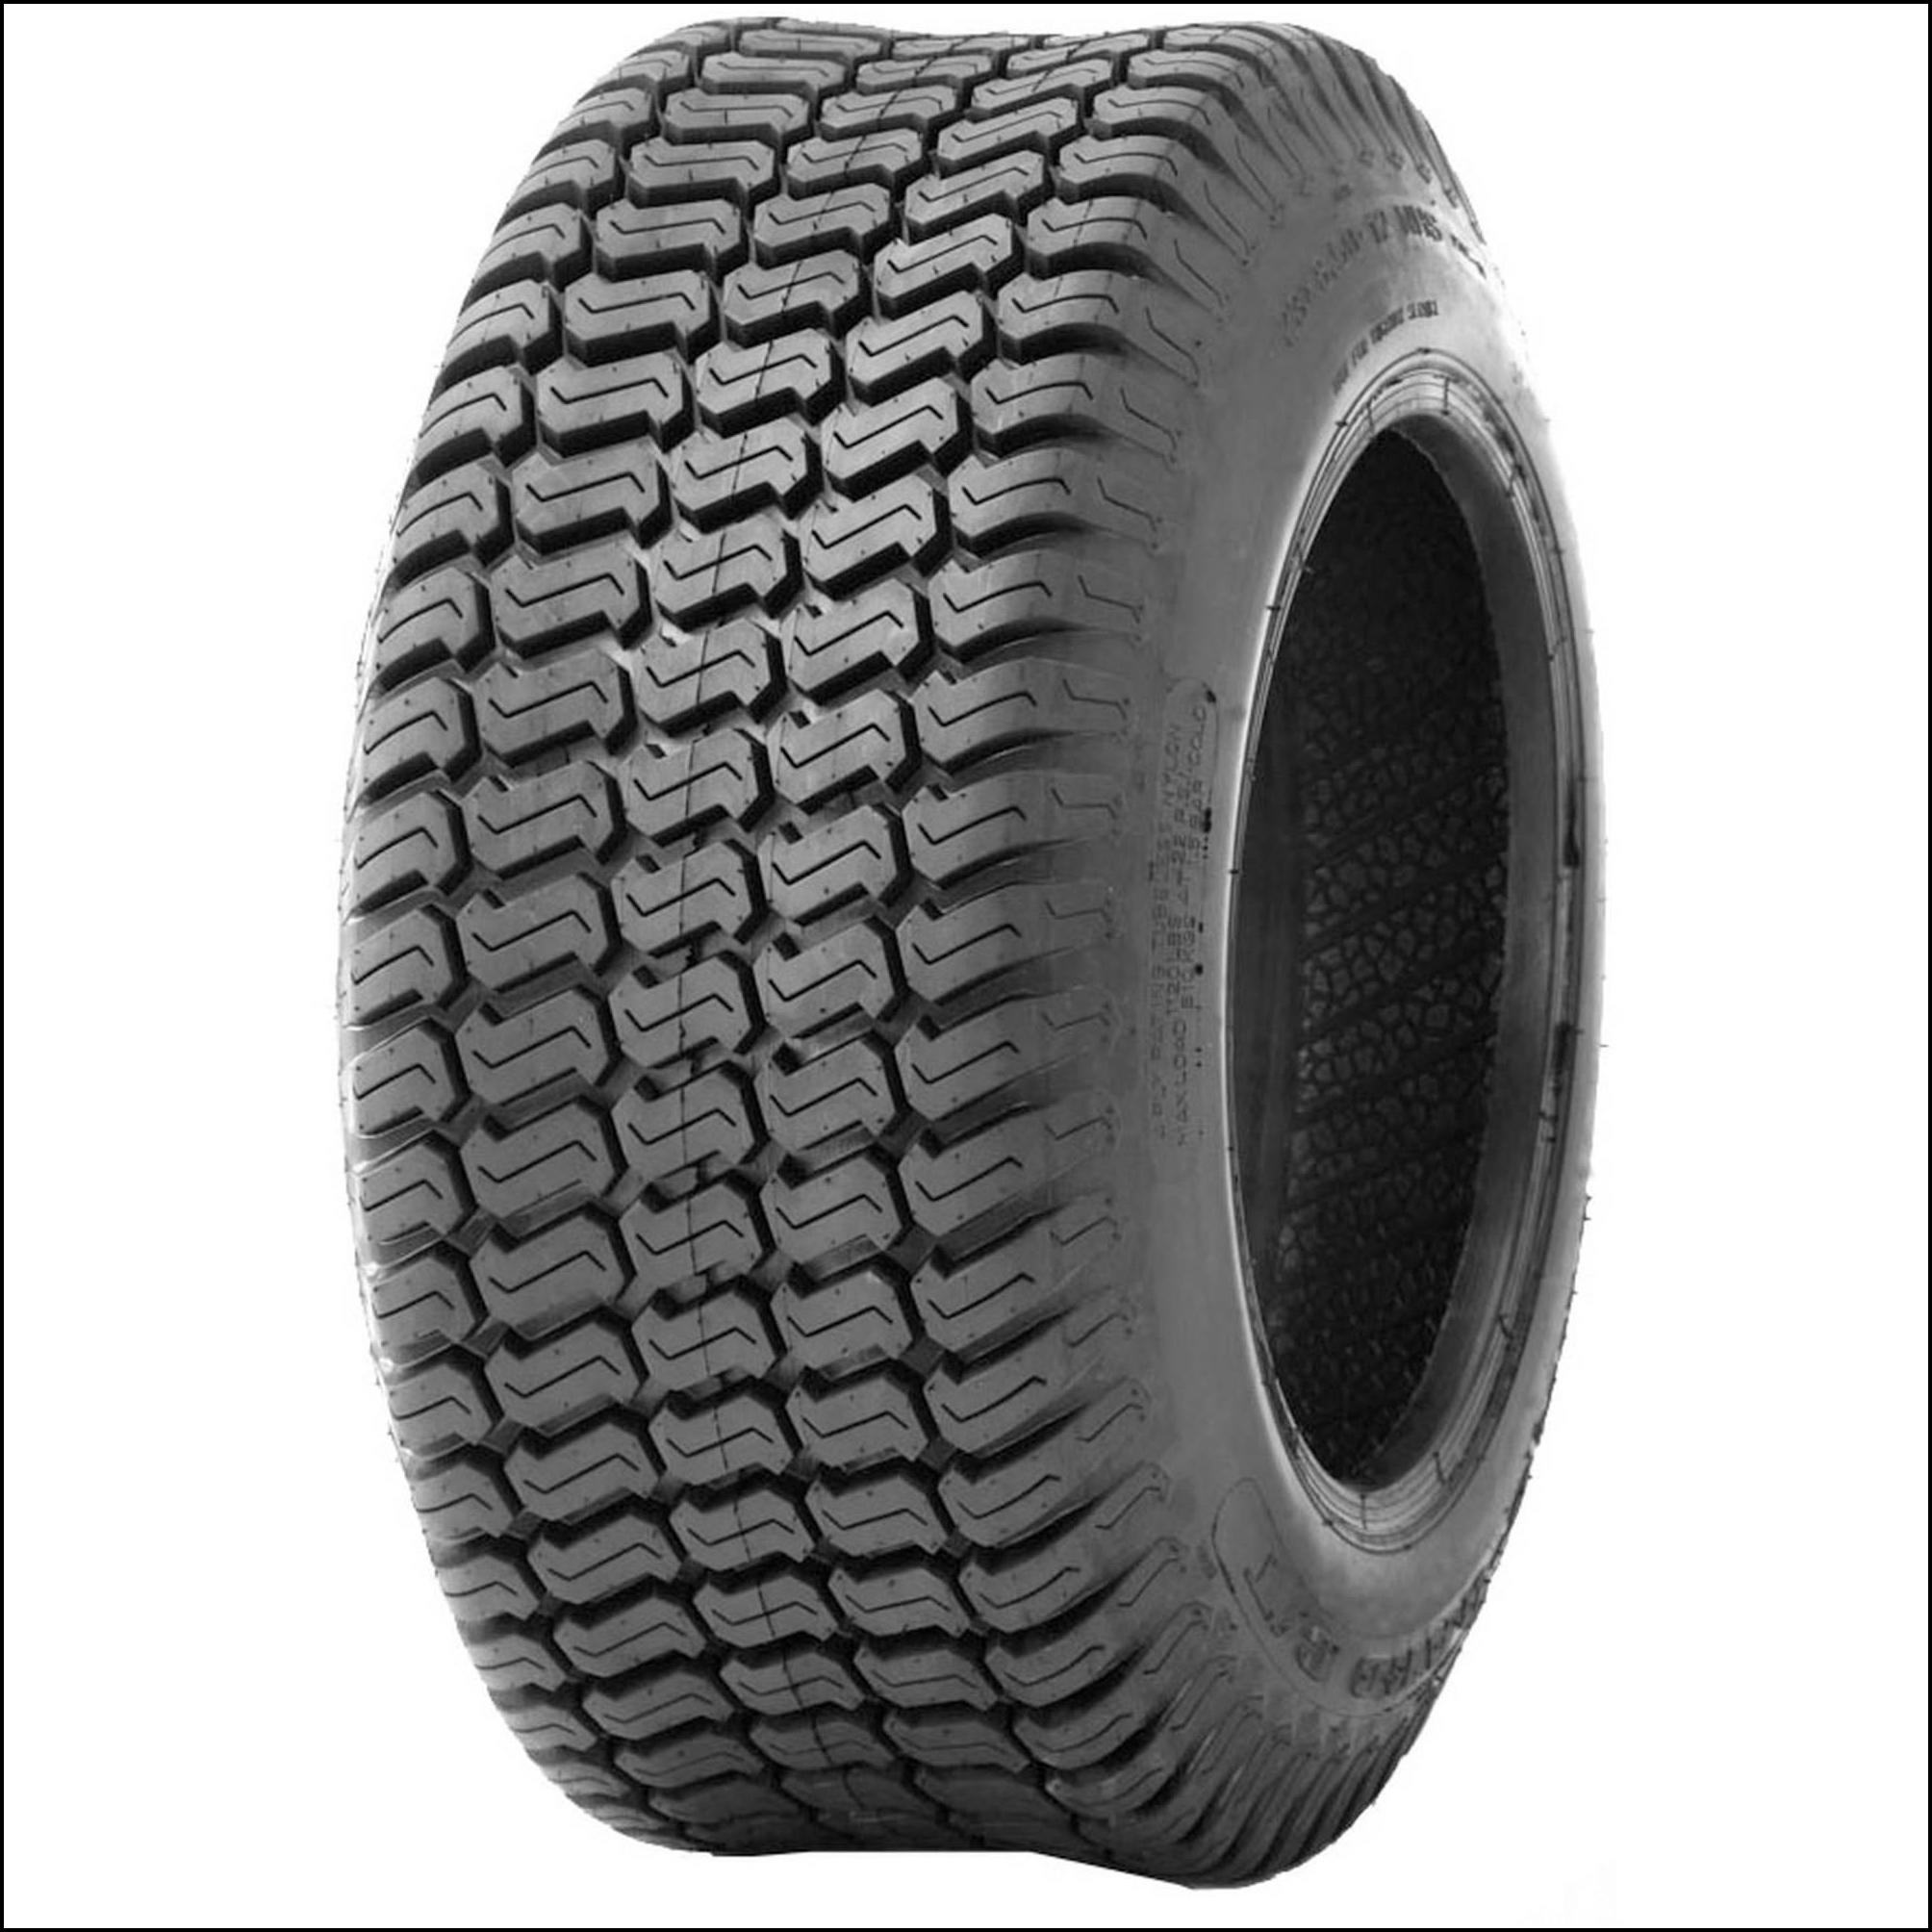 Walmart Lawn Mower Tires